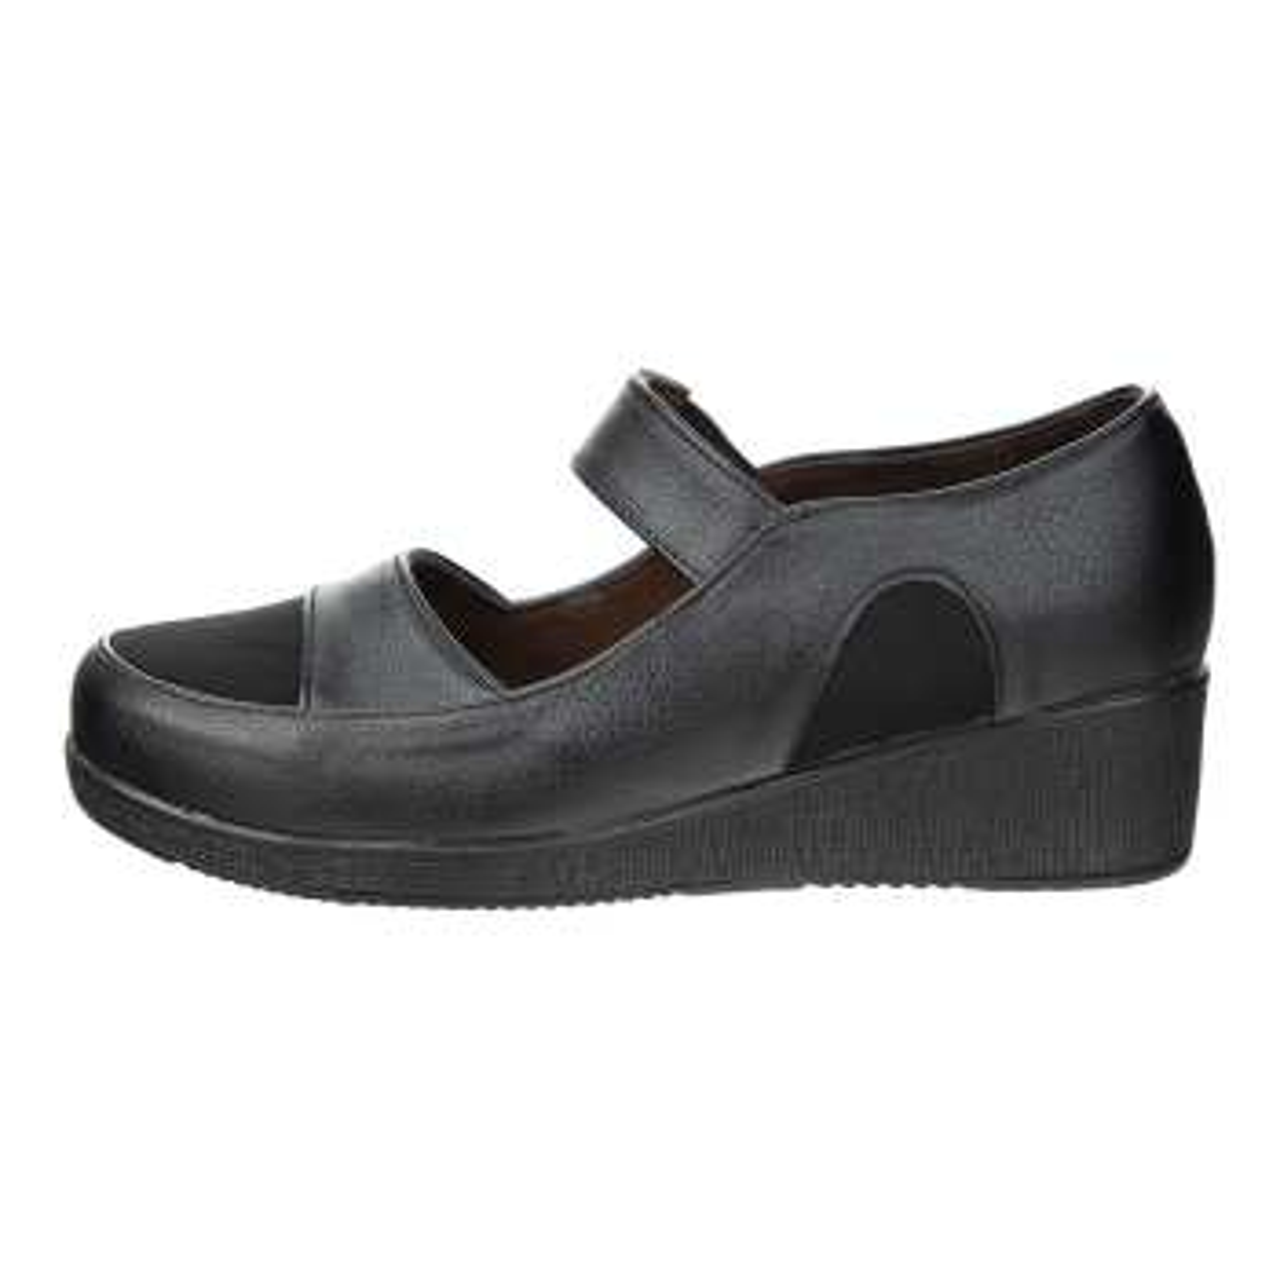 کفش زنانه سینا مدل آیدا مشکی کد 15